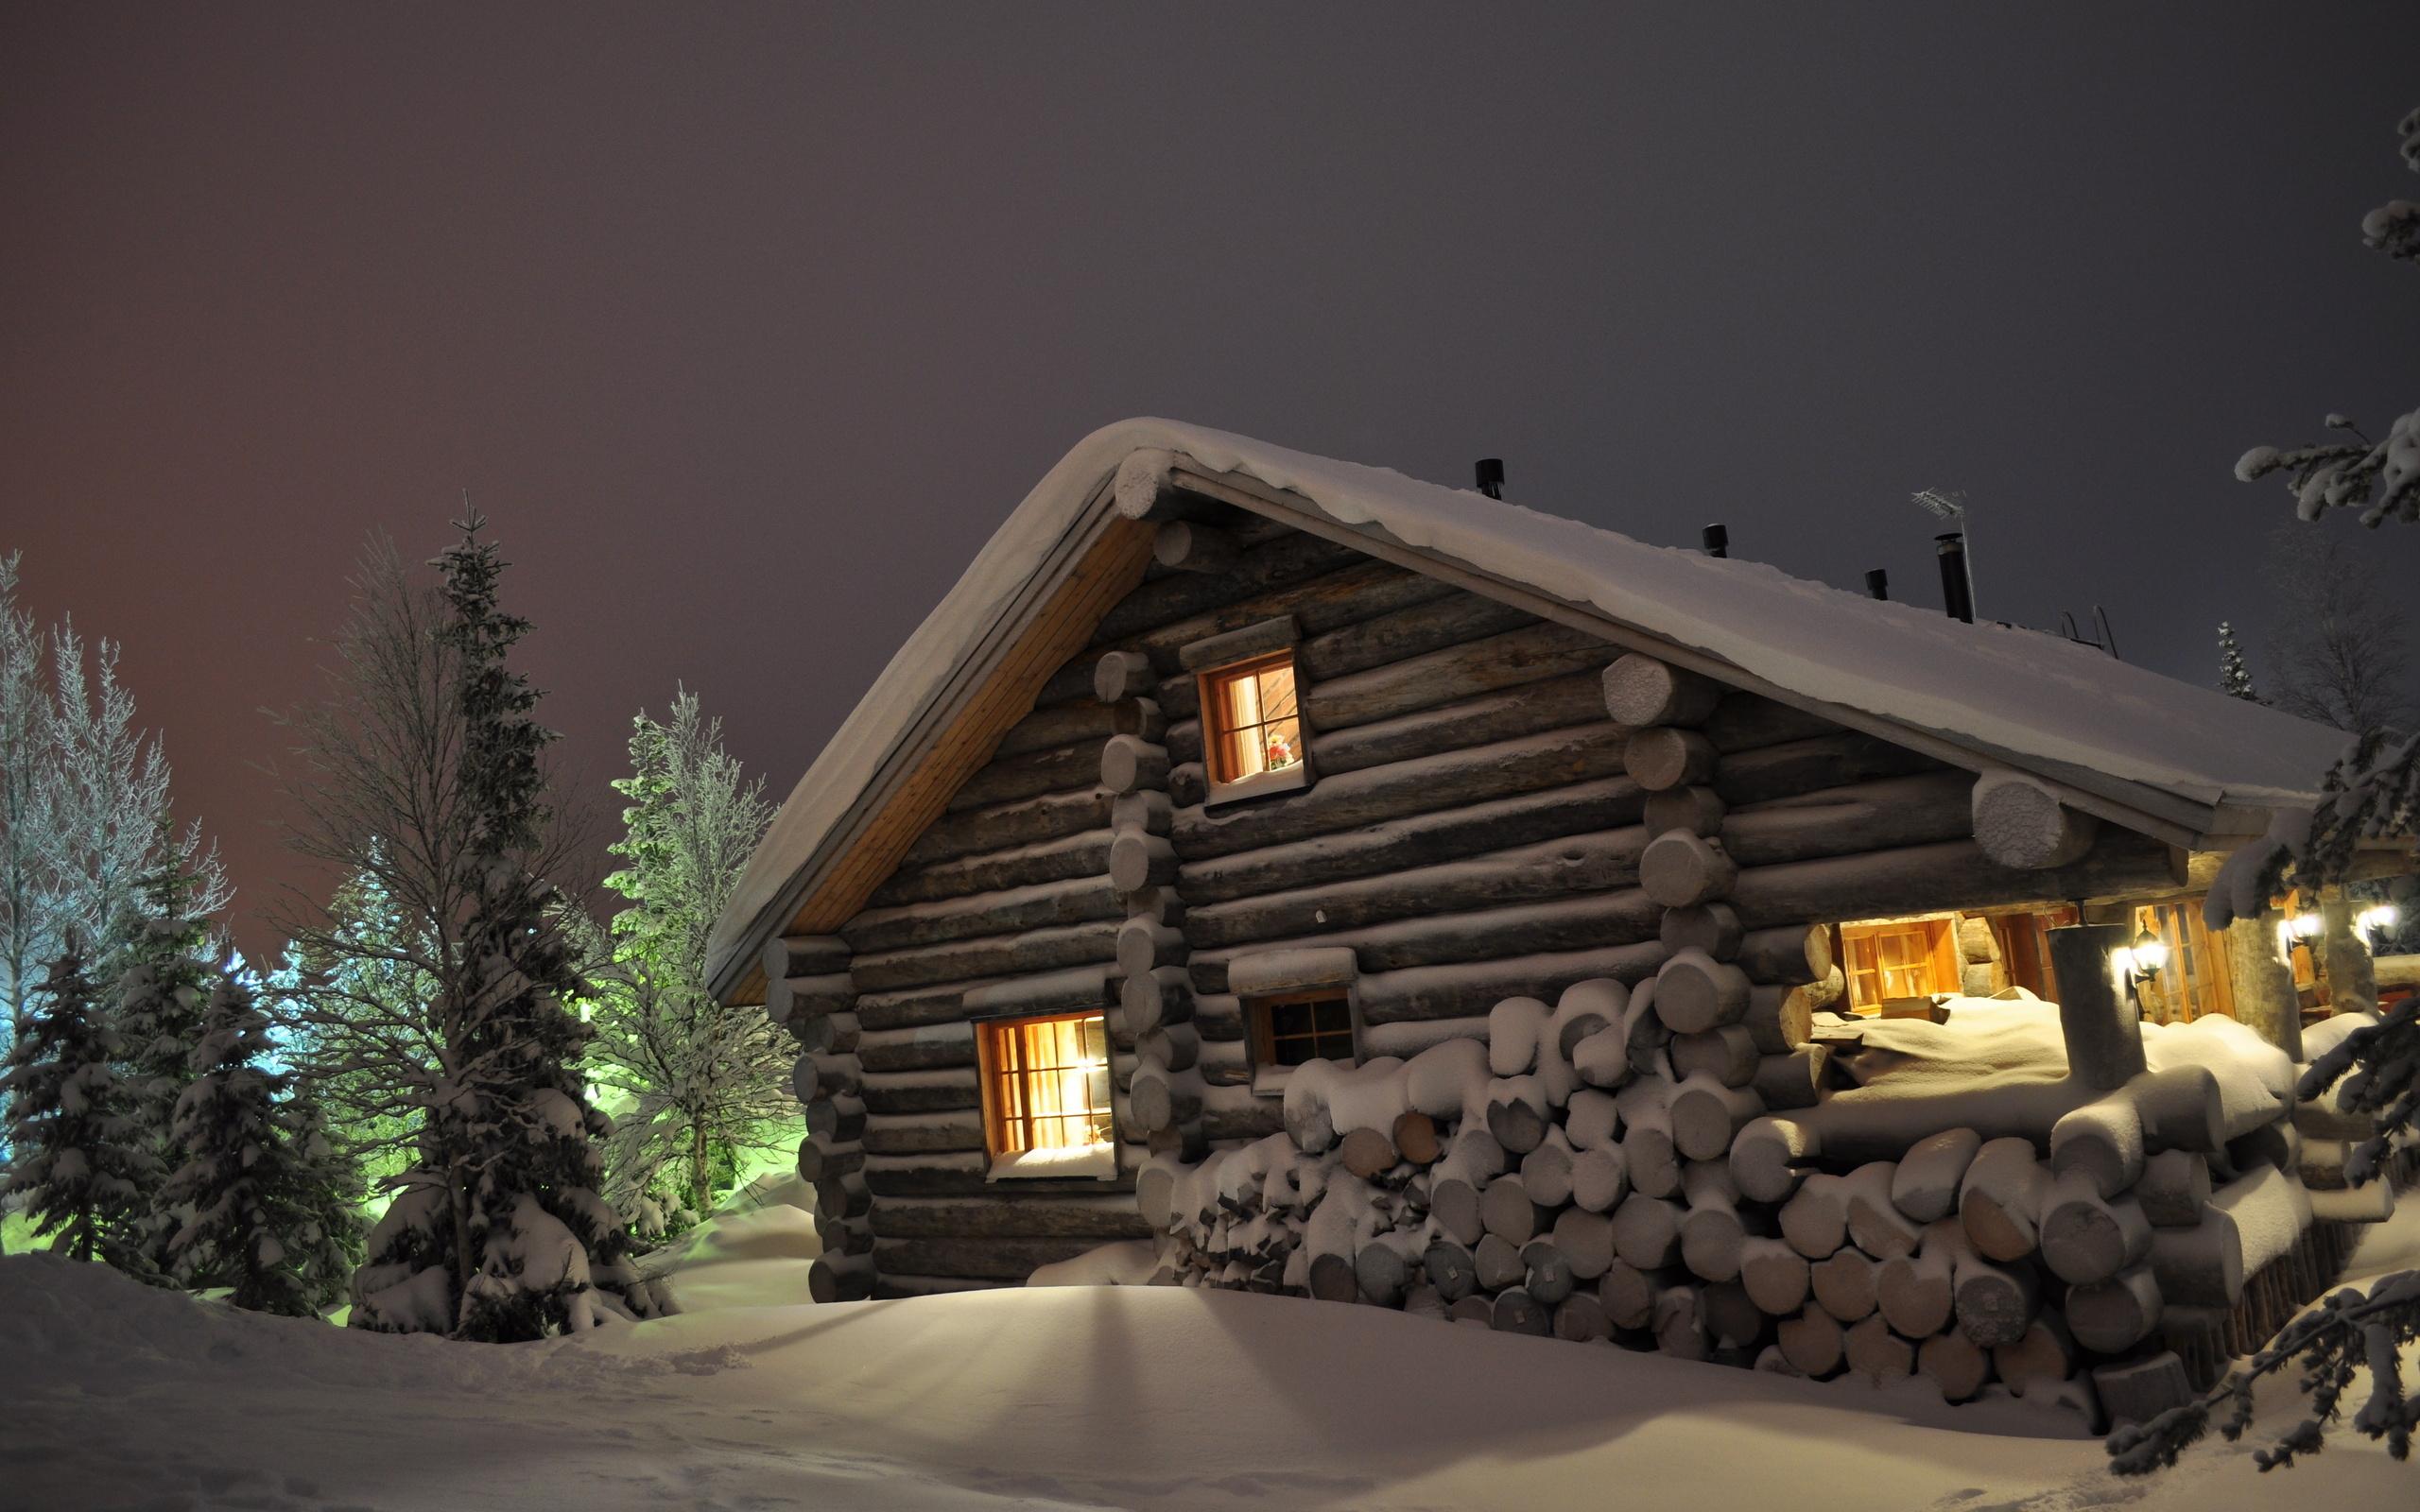 Wallpaper winter snow drifts log cabin wood night eating winter 2560x1600